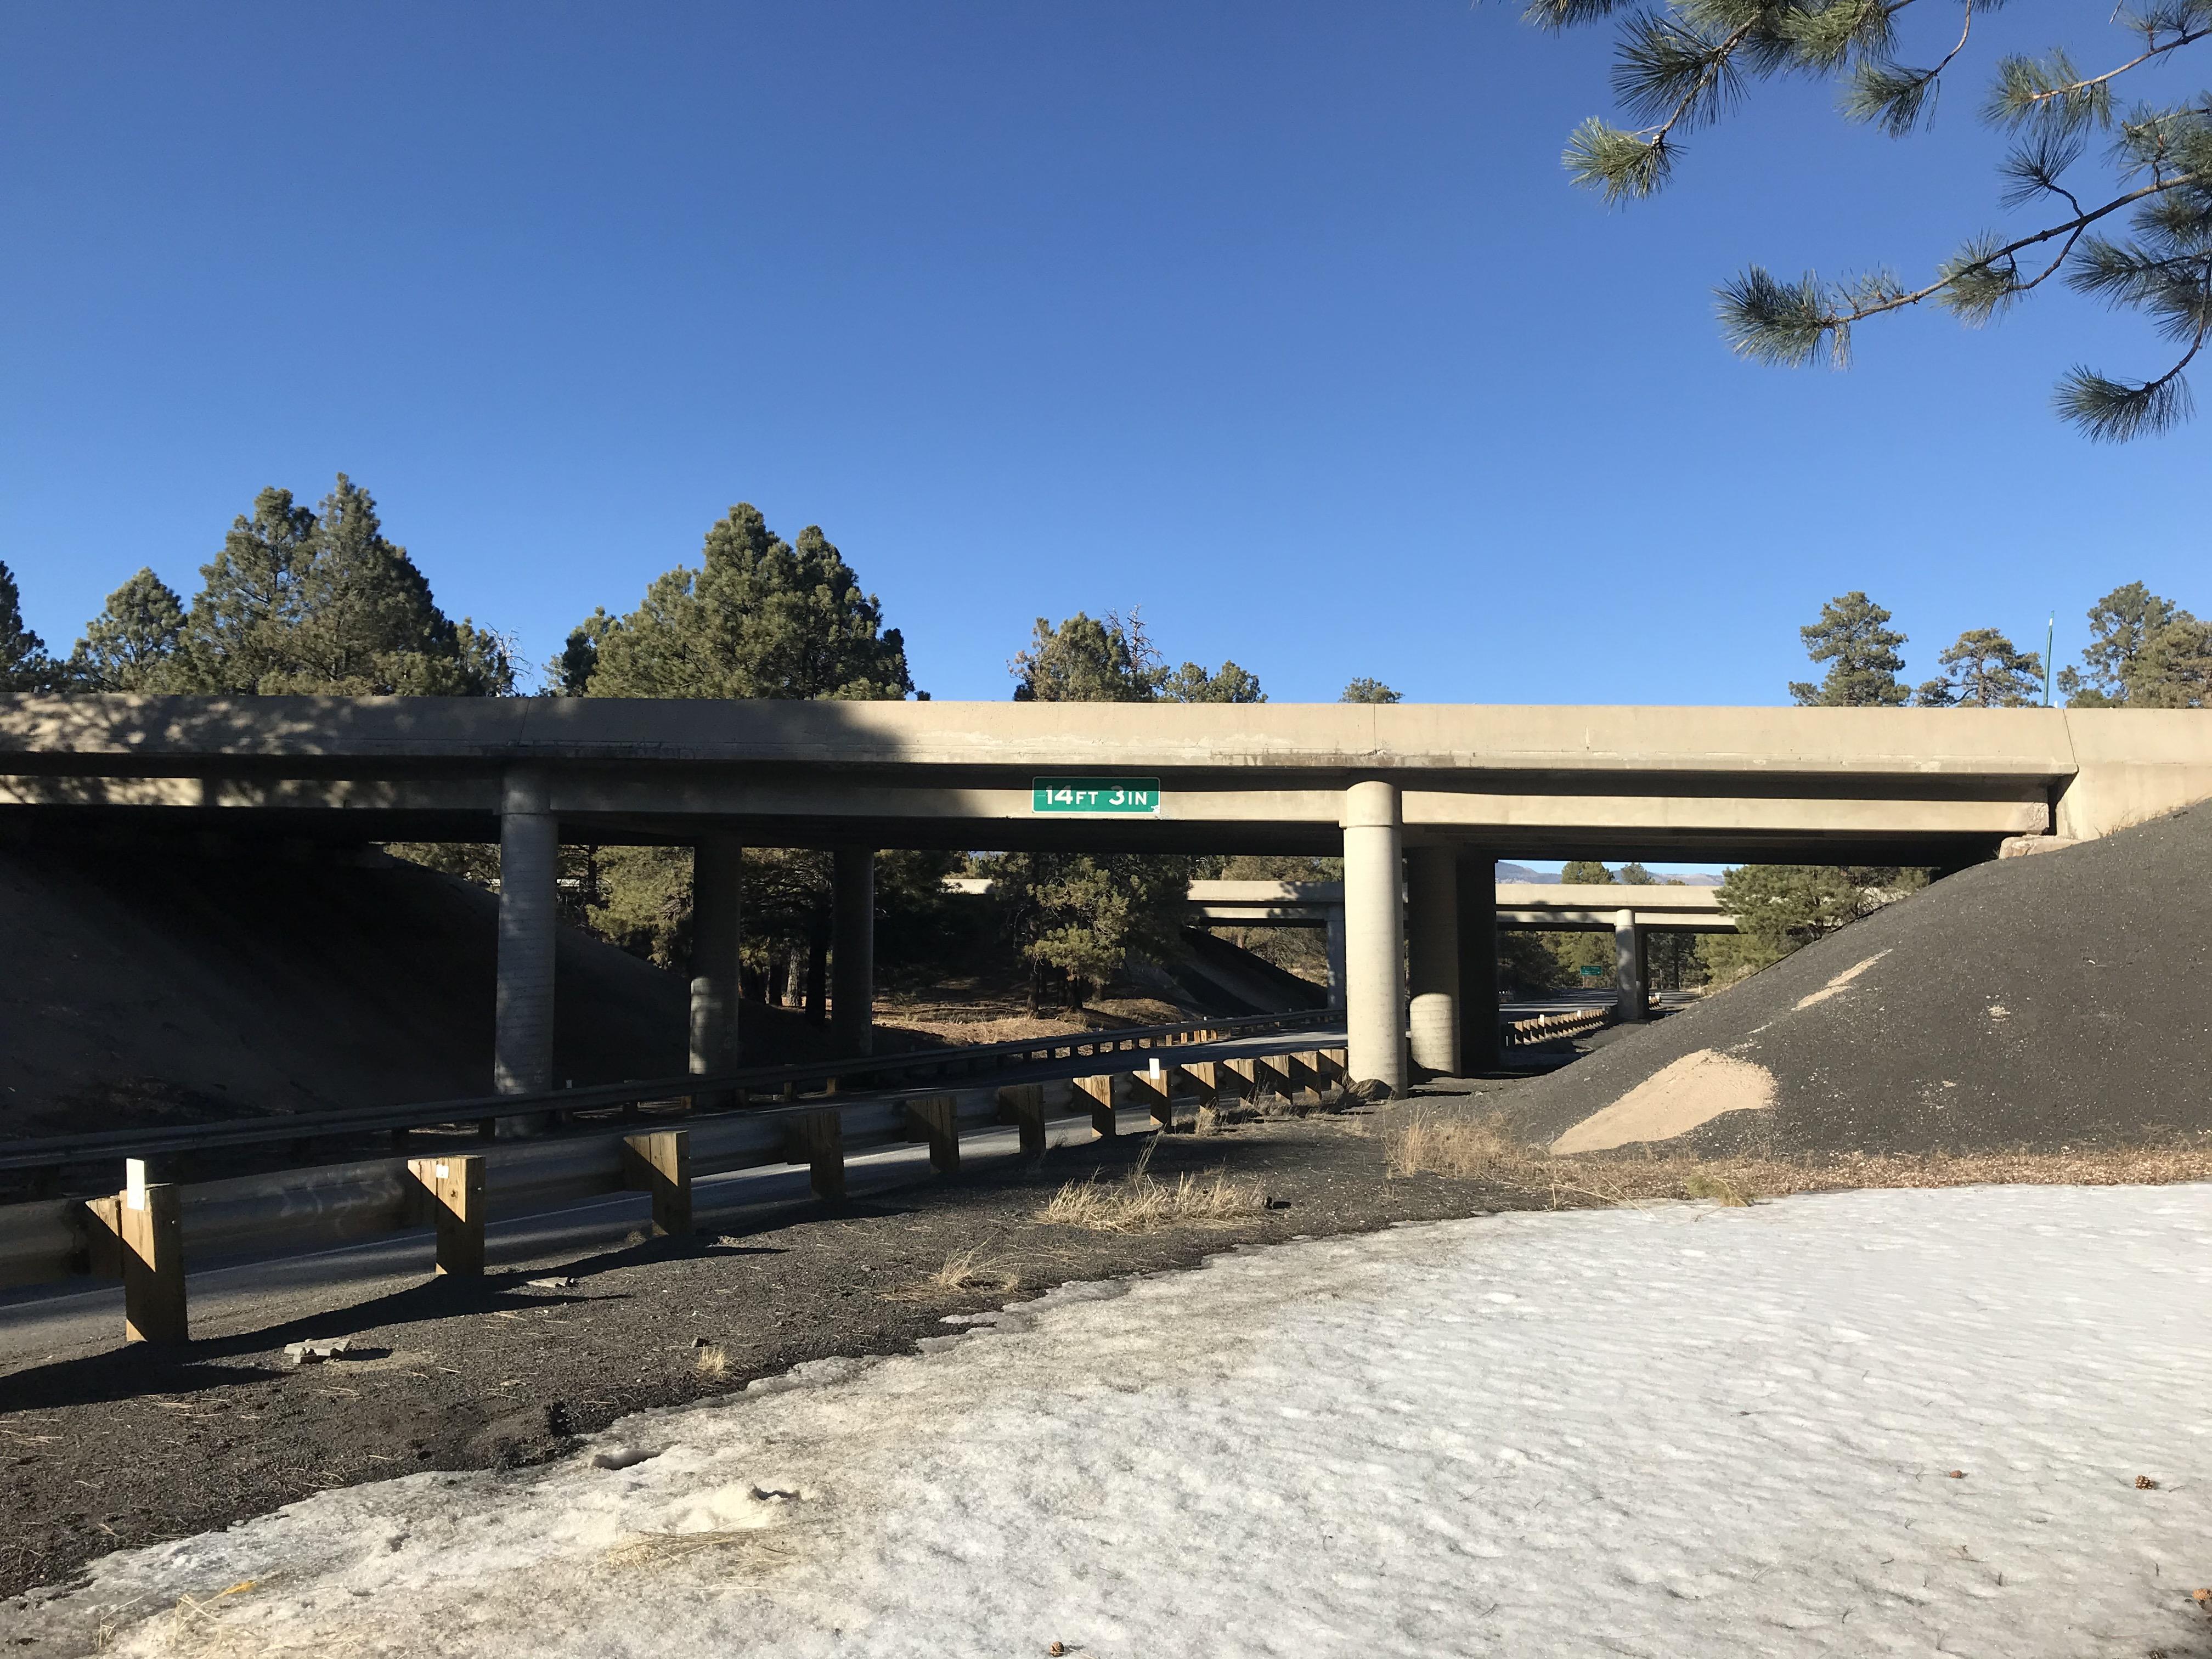 I-40 bridge over B-40